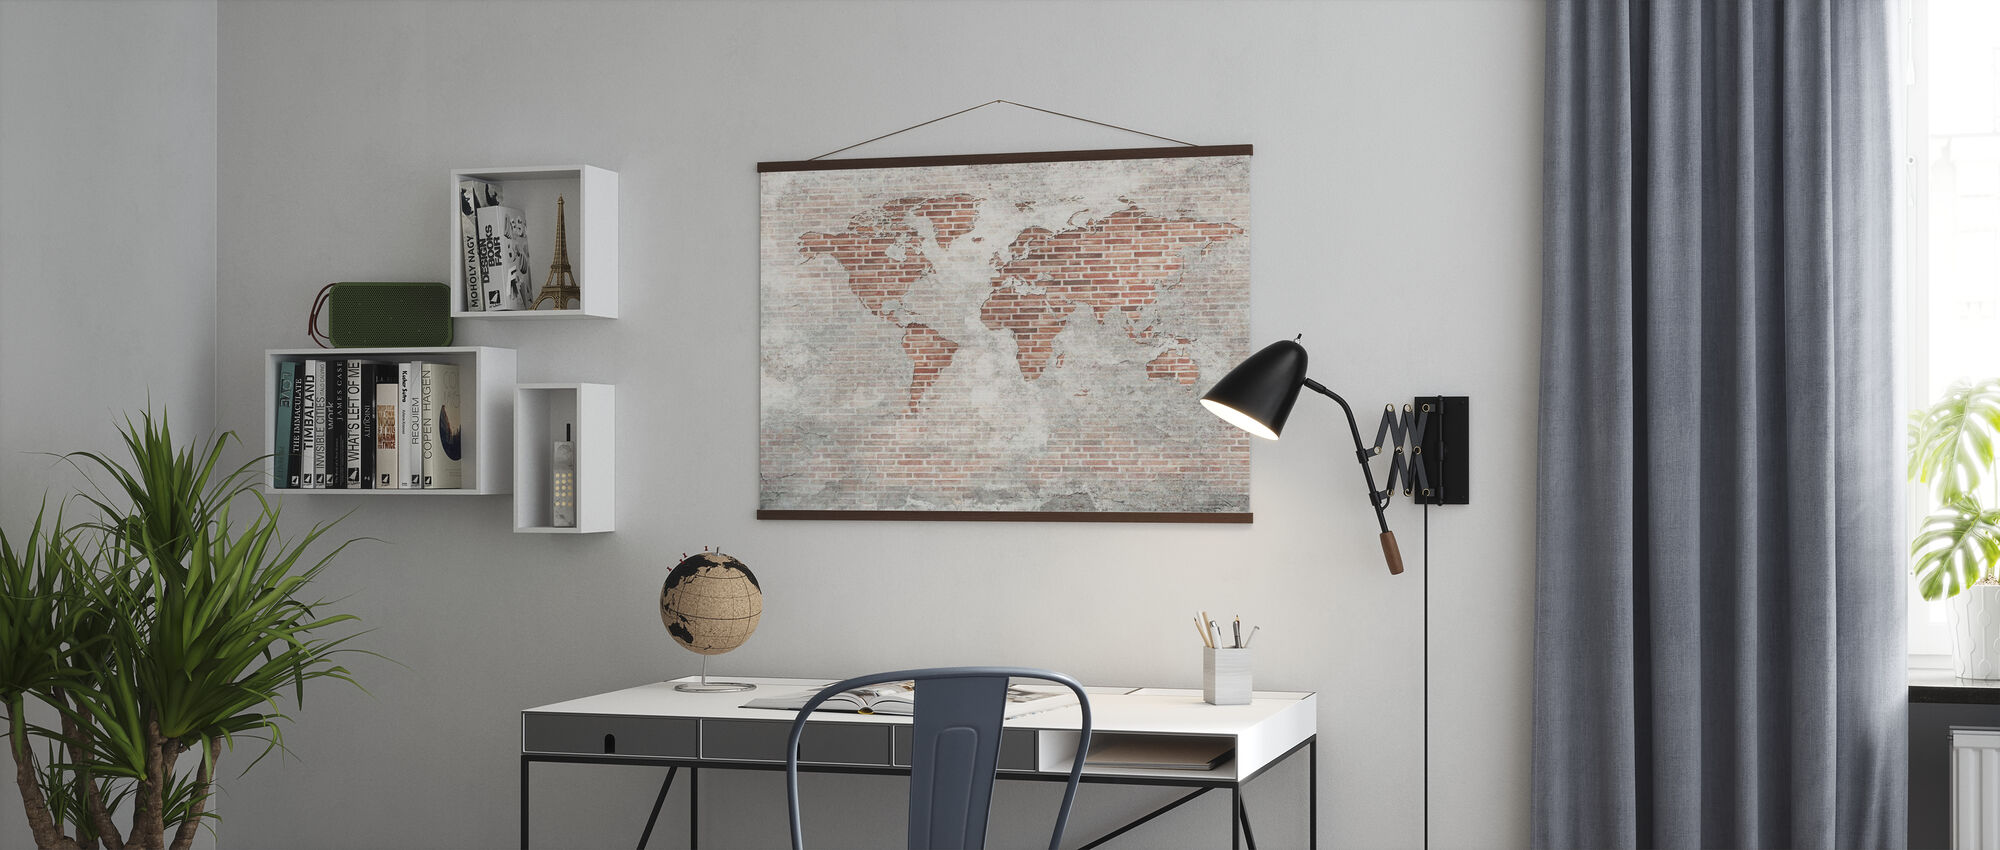 Brick Wall World Map - Poster - Office